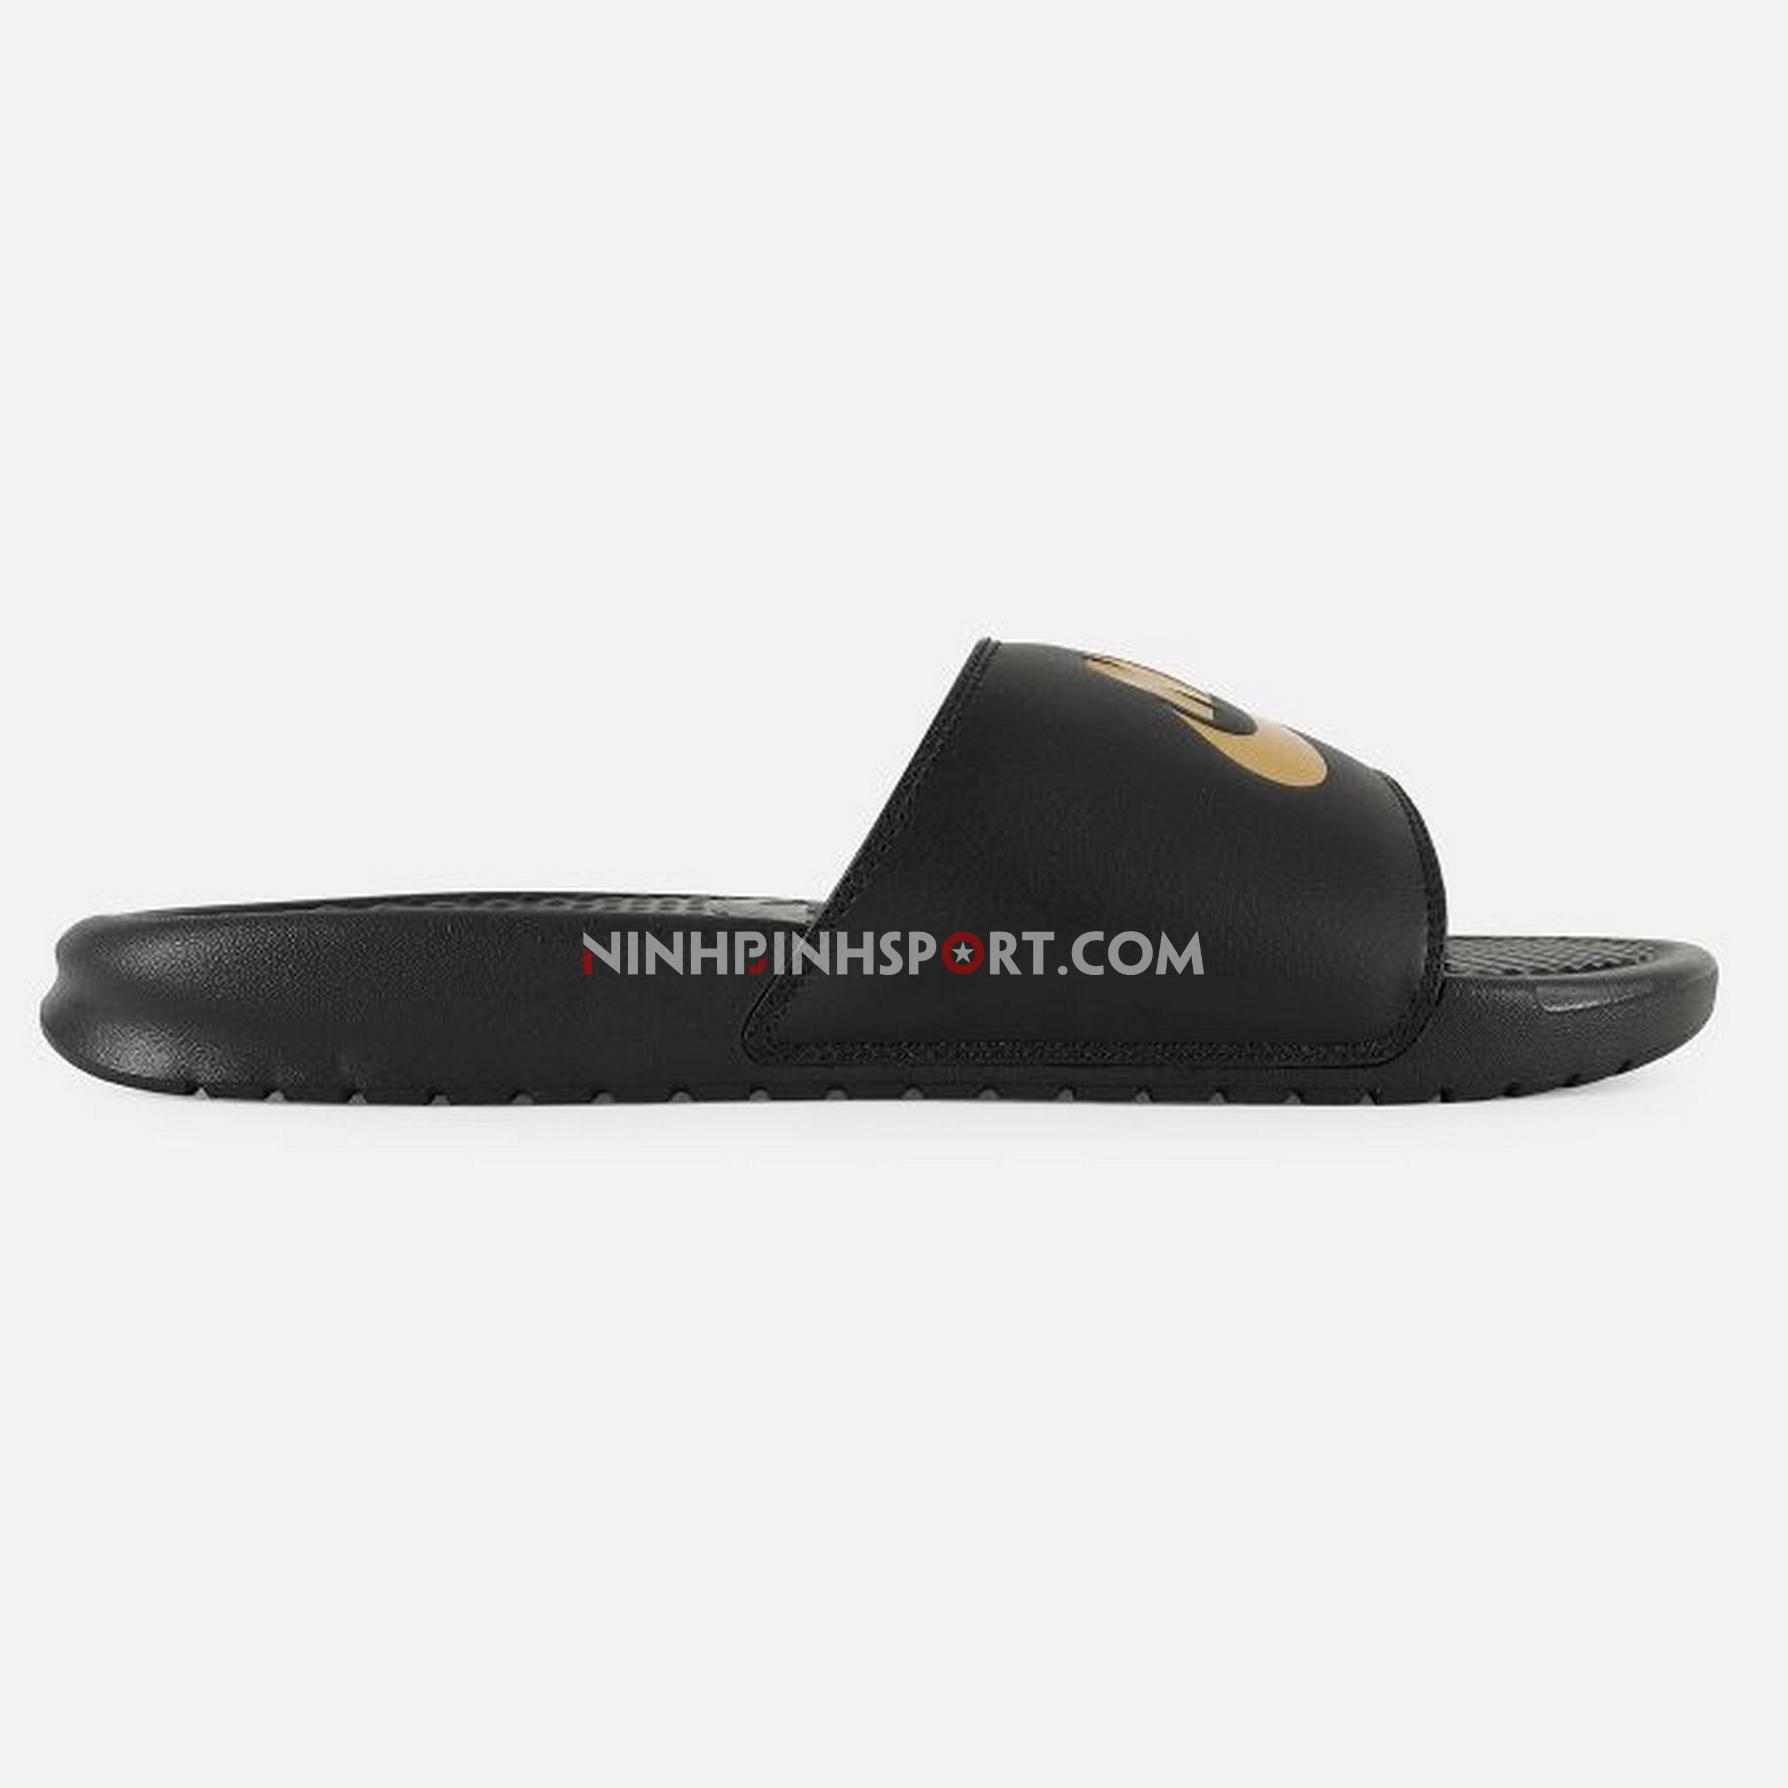 Dép thể thao nam Nike Benassi JDI 343880-016